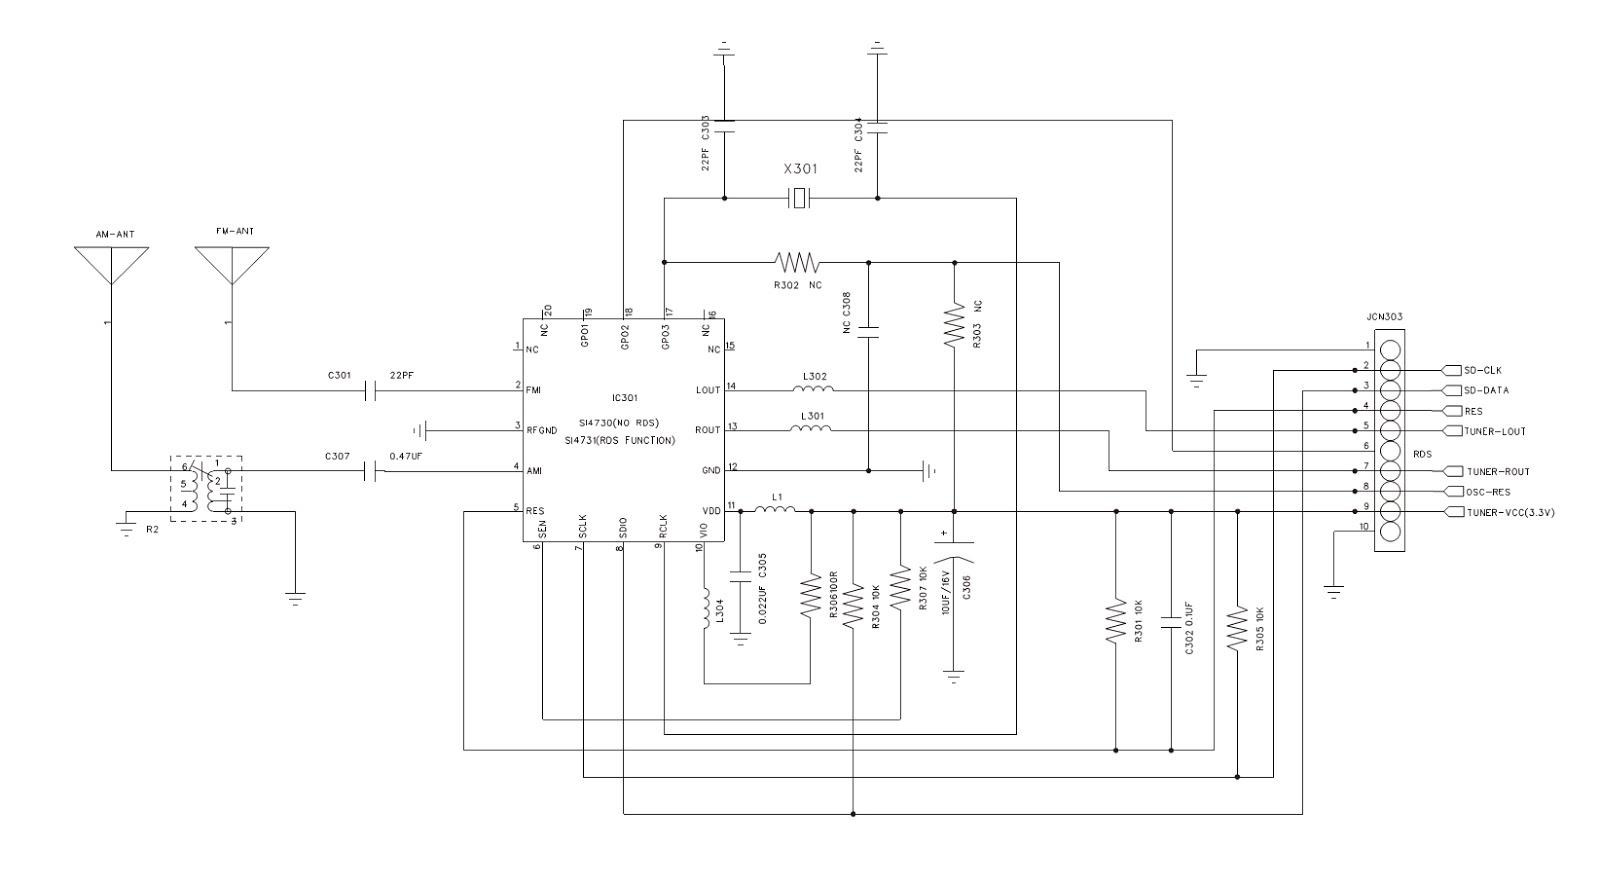 philips fwm6500 schematic diagrams printed circuit boards electro help Radio Shack Circuit Board Parts printed circuit board schematics for e78017